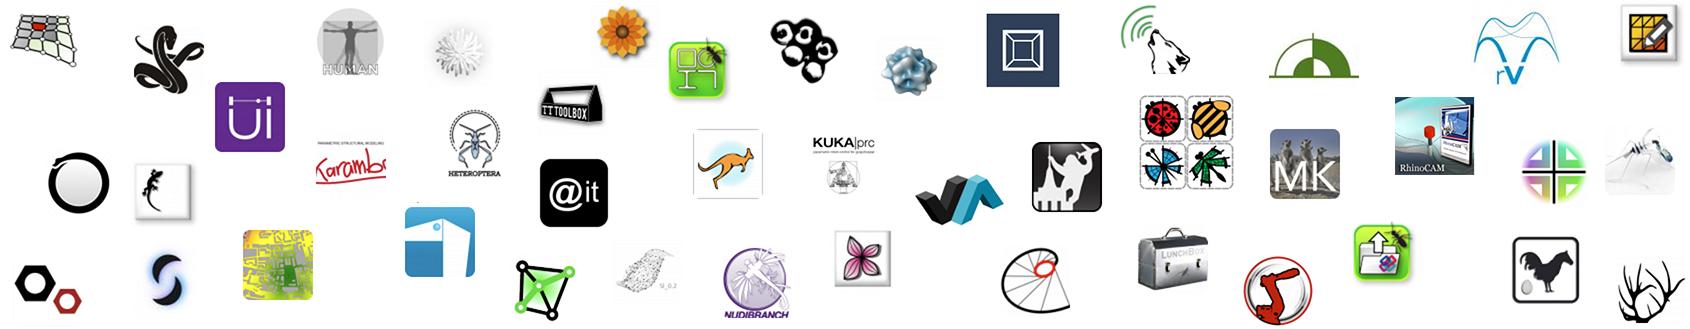 Development Platform - New in Rhino 6